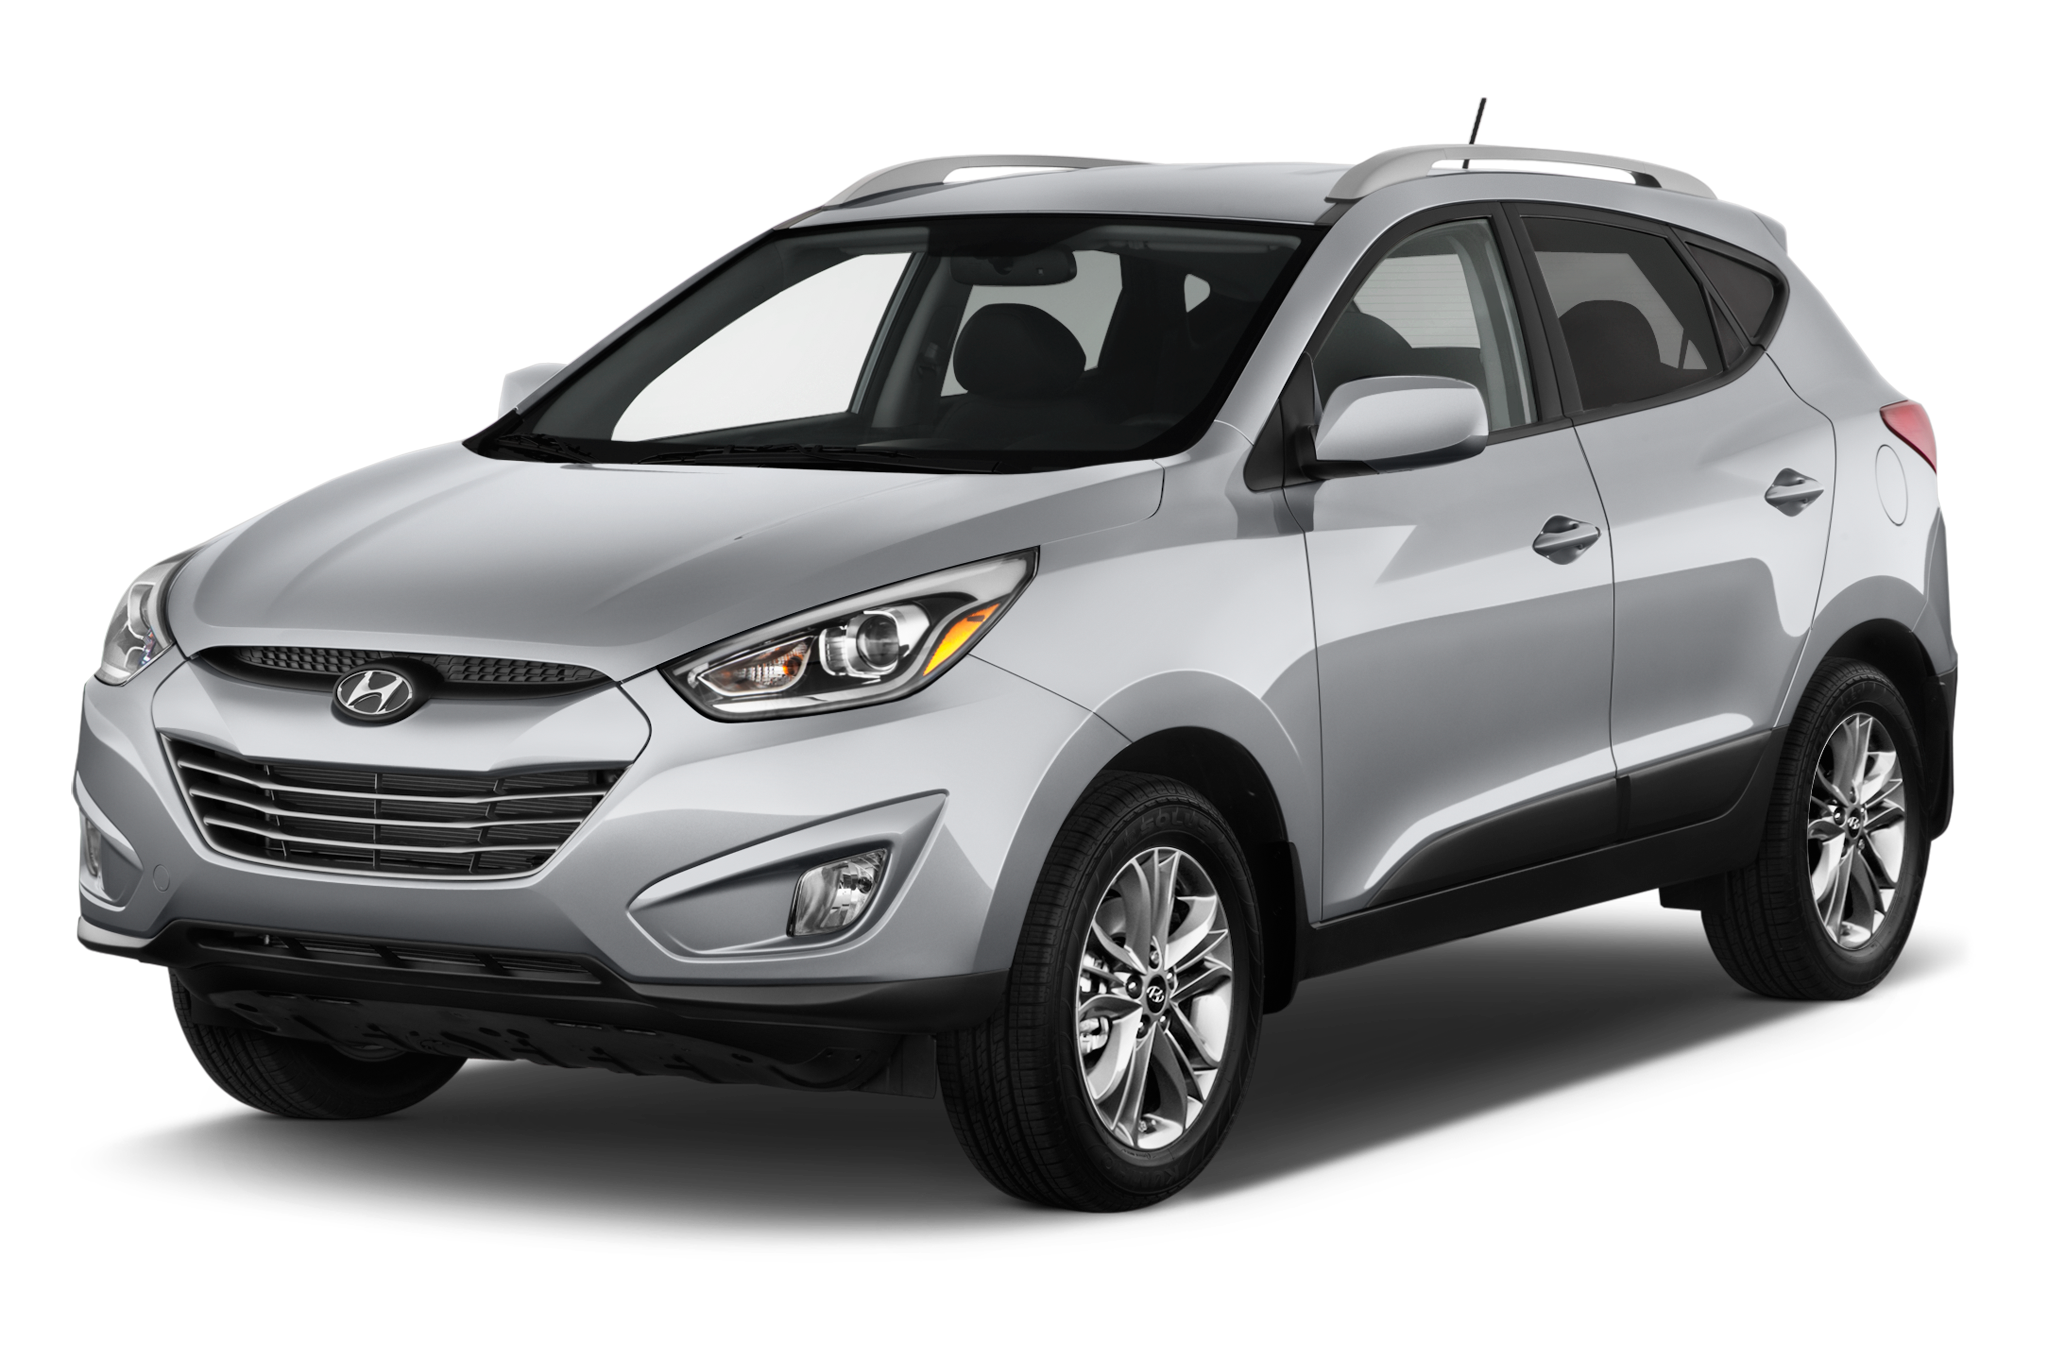 cars review fe santa expert drive test sport hyundai of